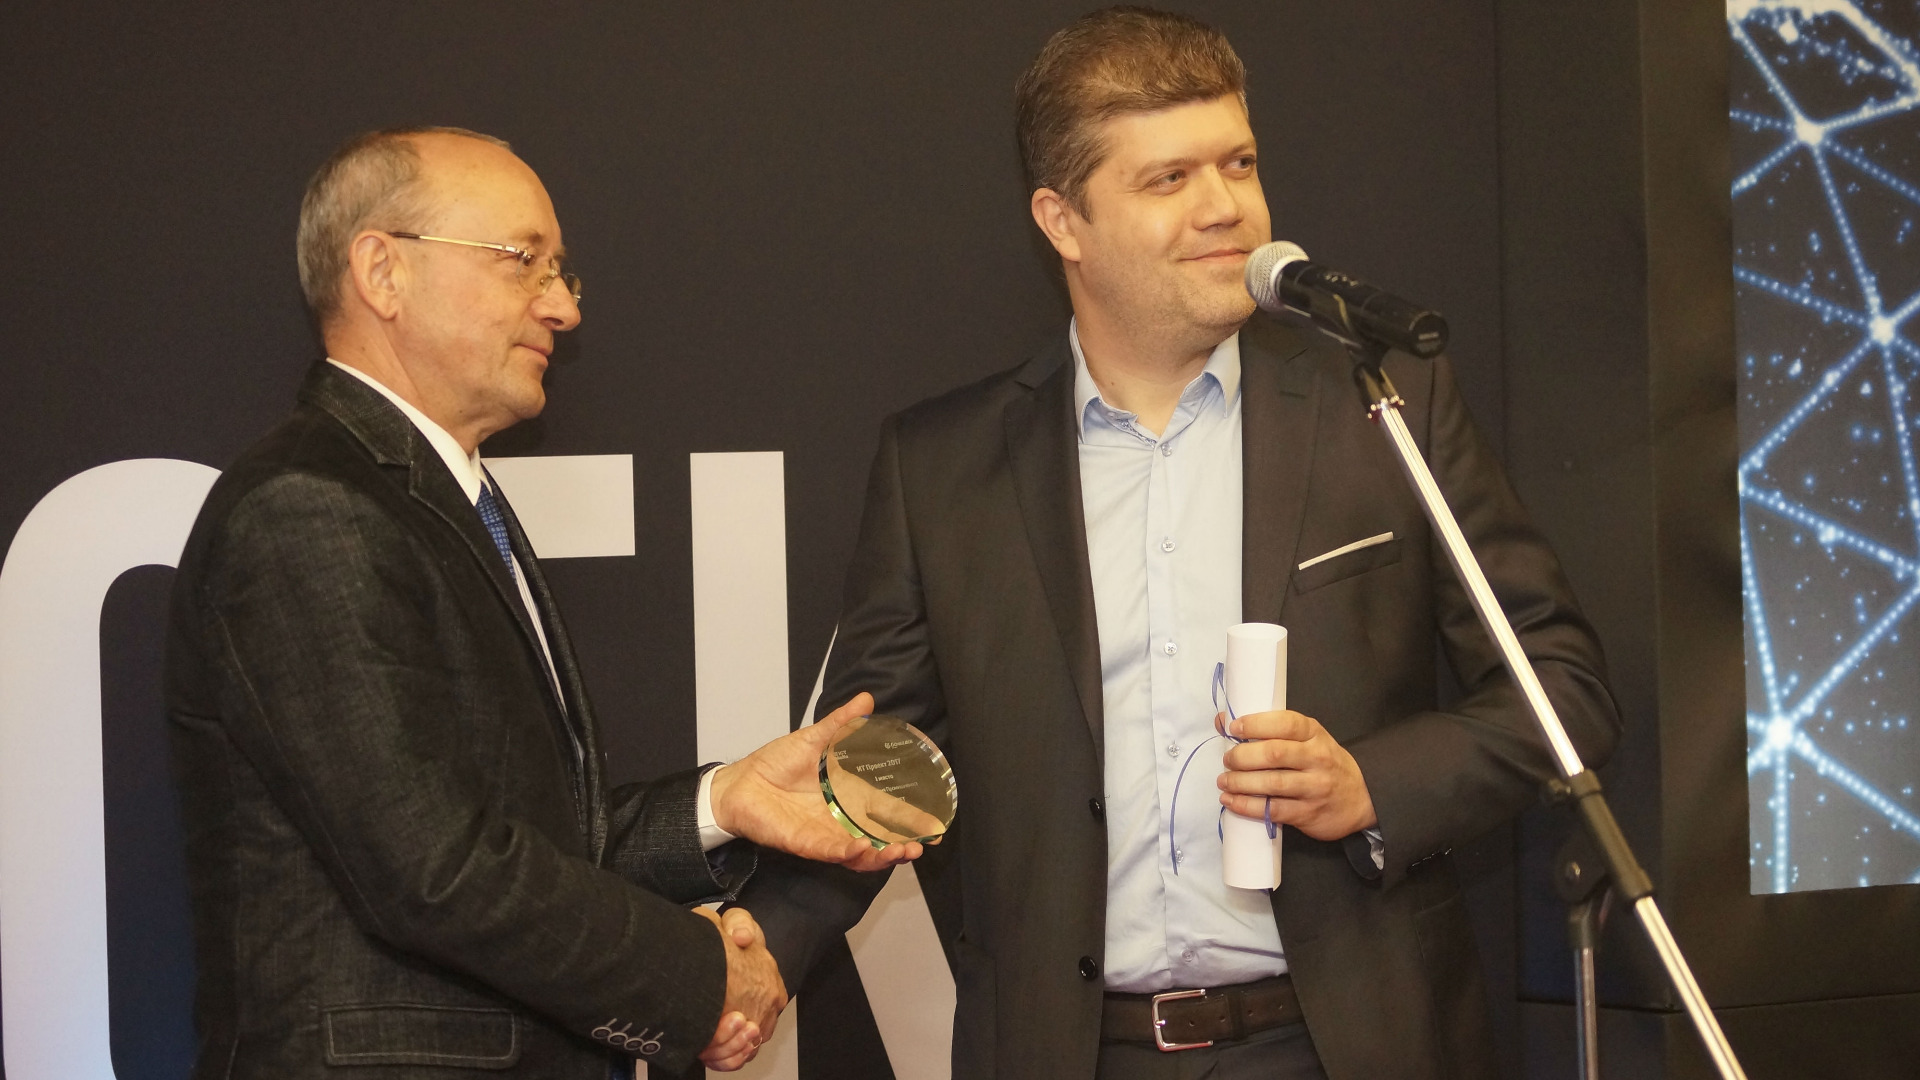 Георги Апосолов и Цветан Симеонов /вляво/ при връчване на приза